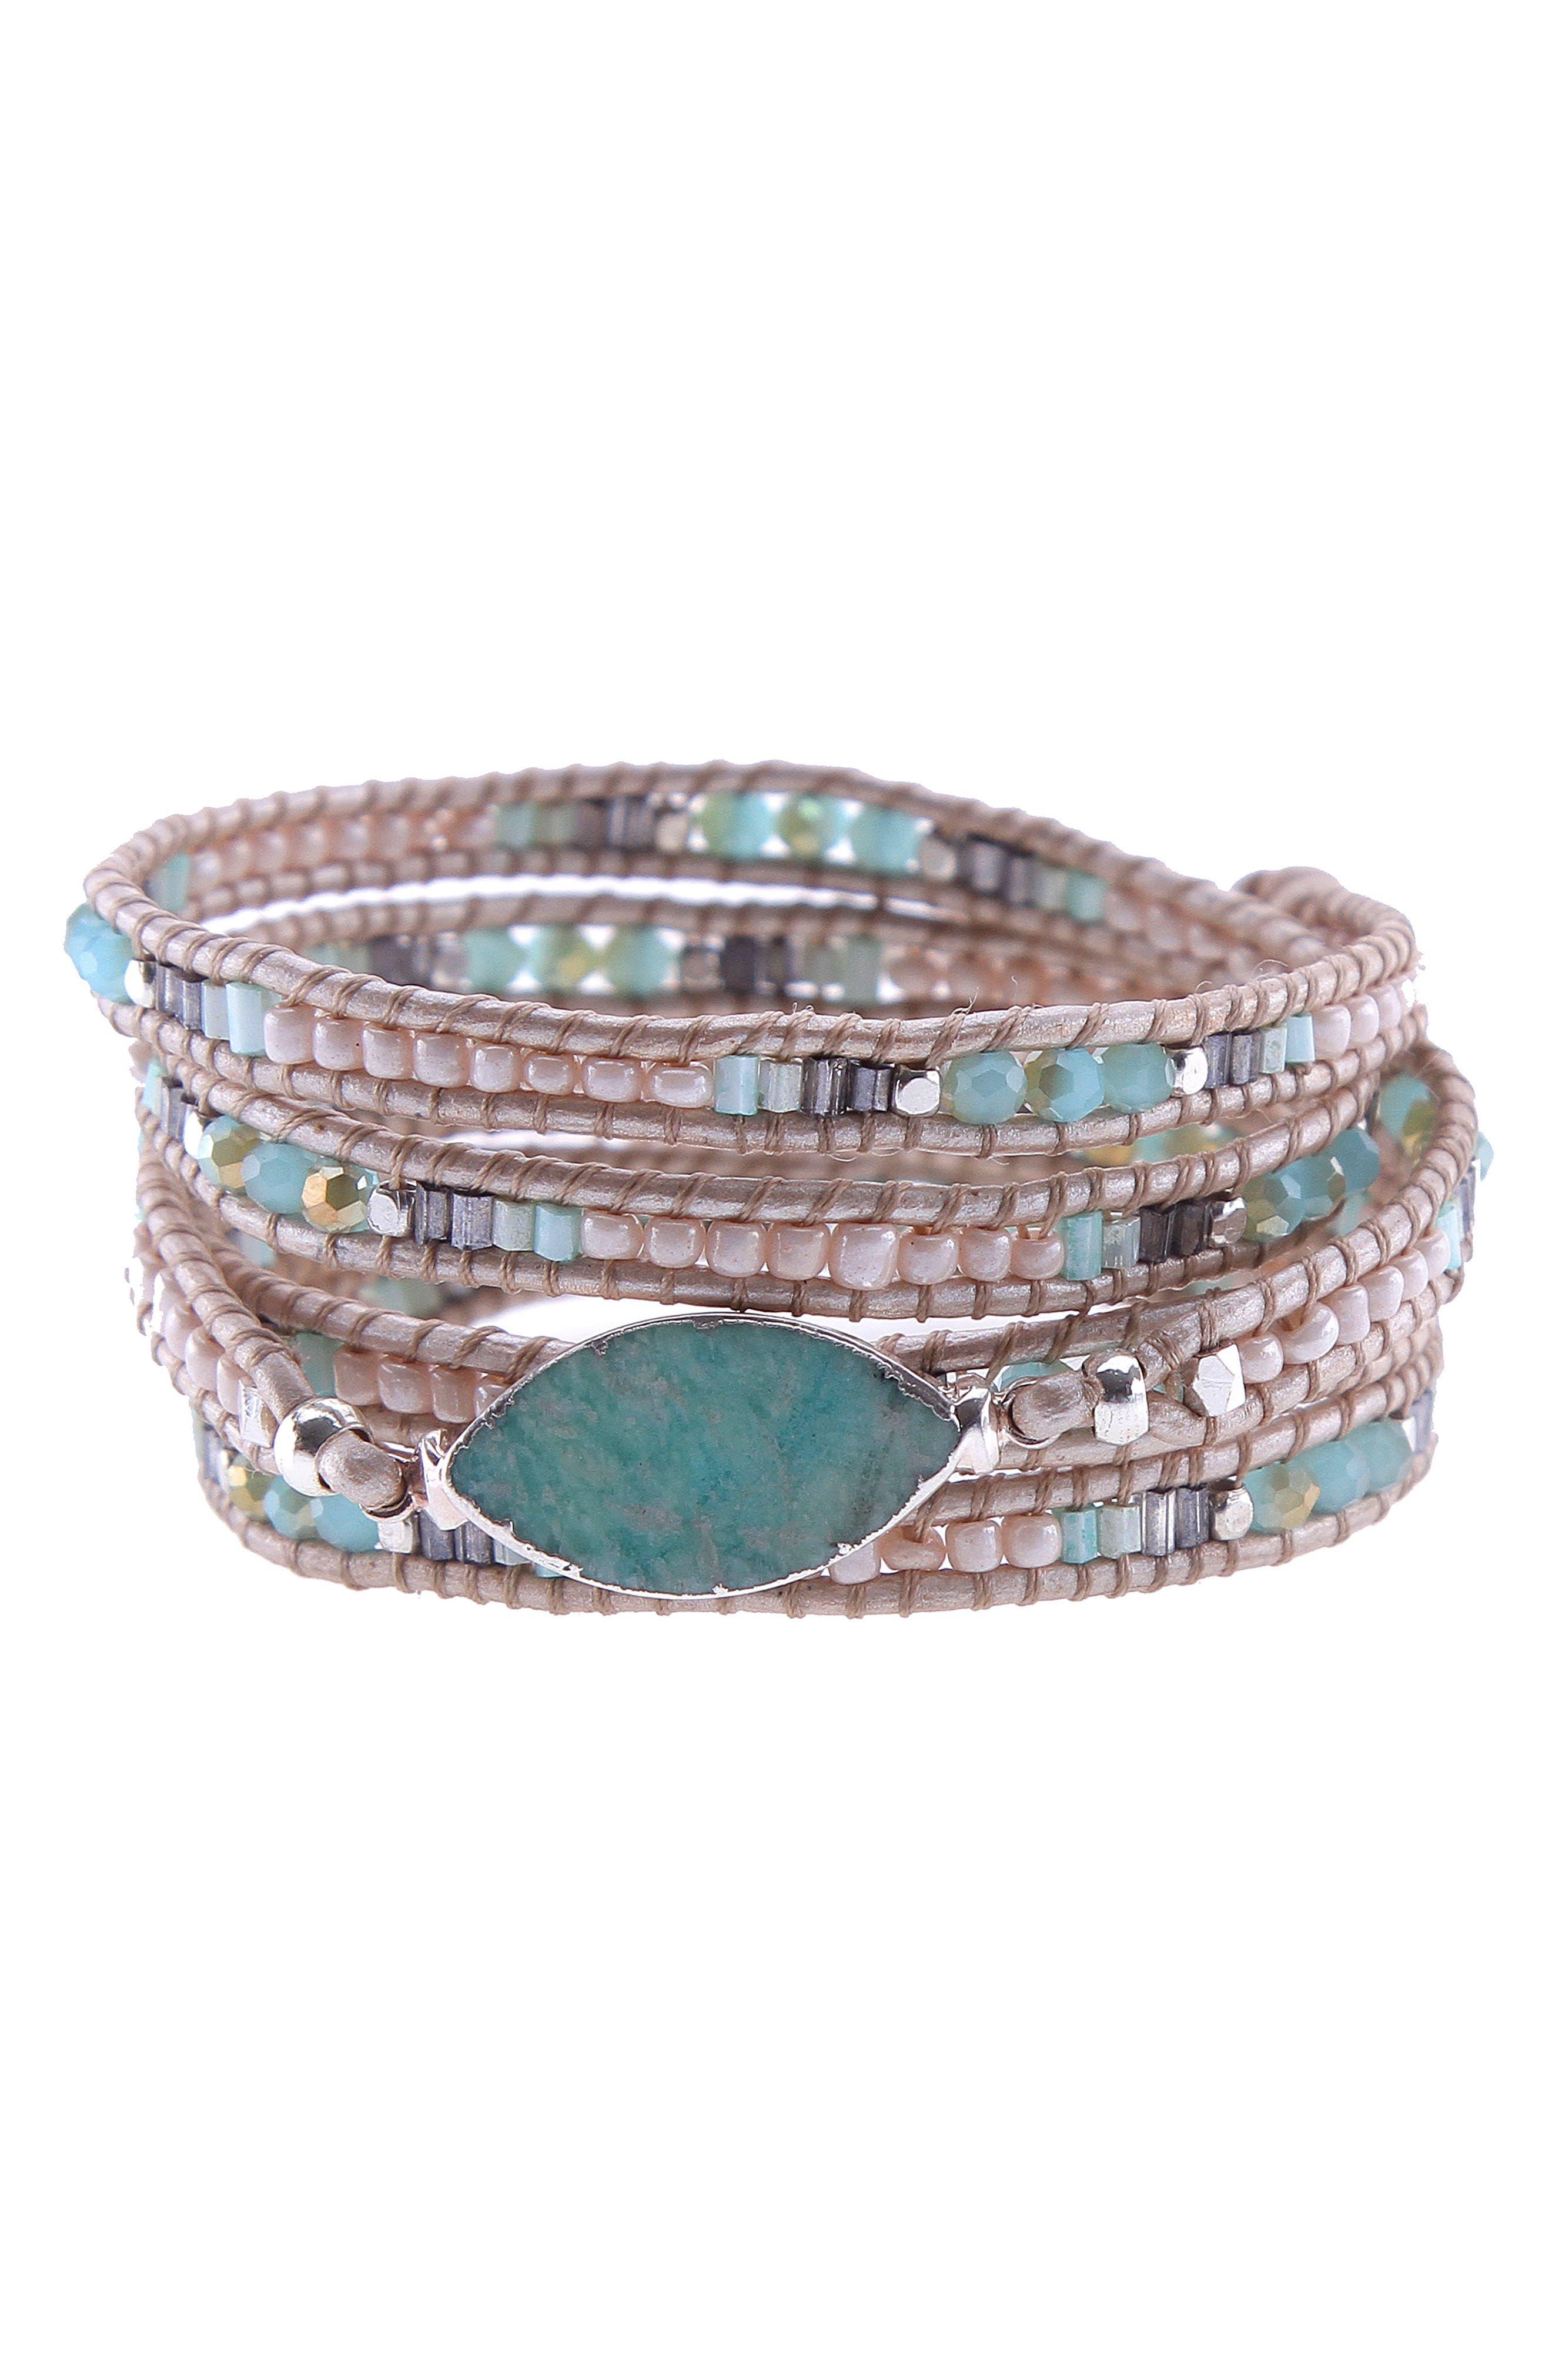 Beaded Agate Wrap Bracelet,                             Main thumbnail 1, color,                             400